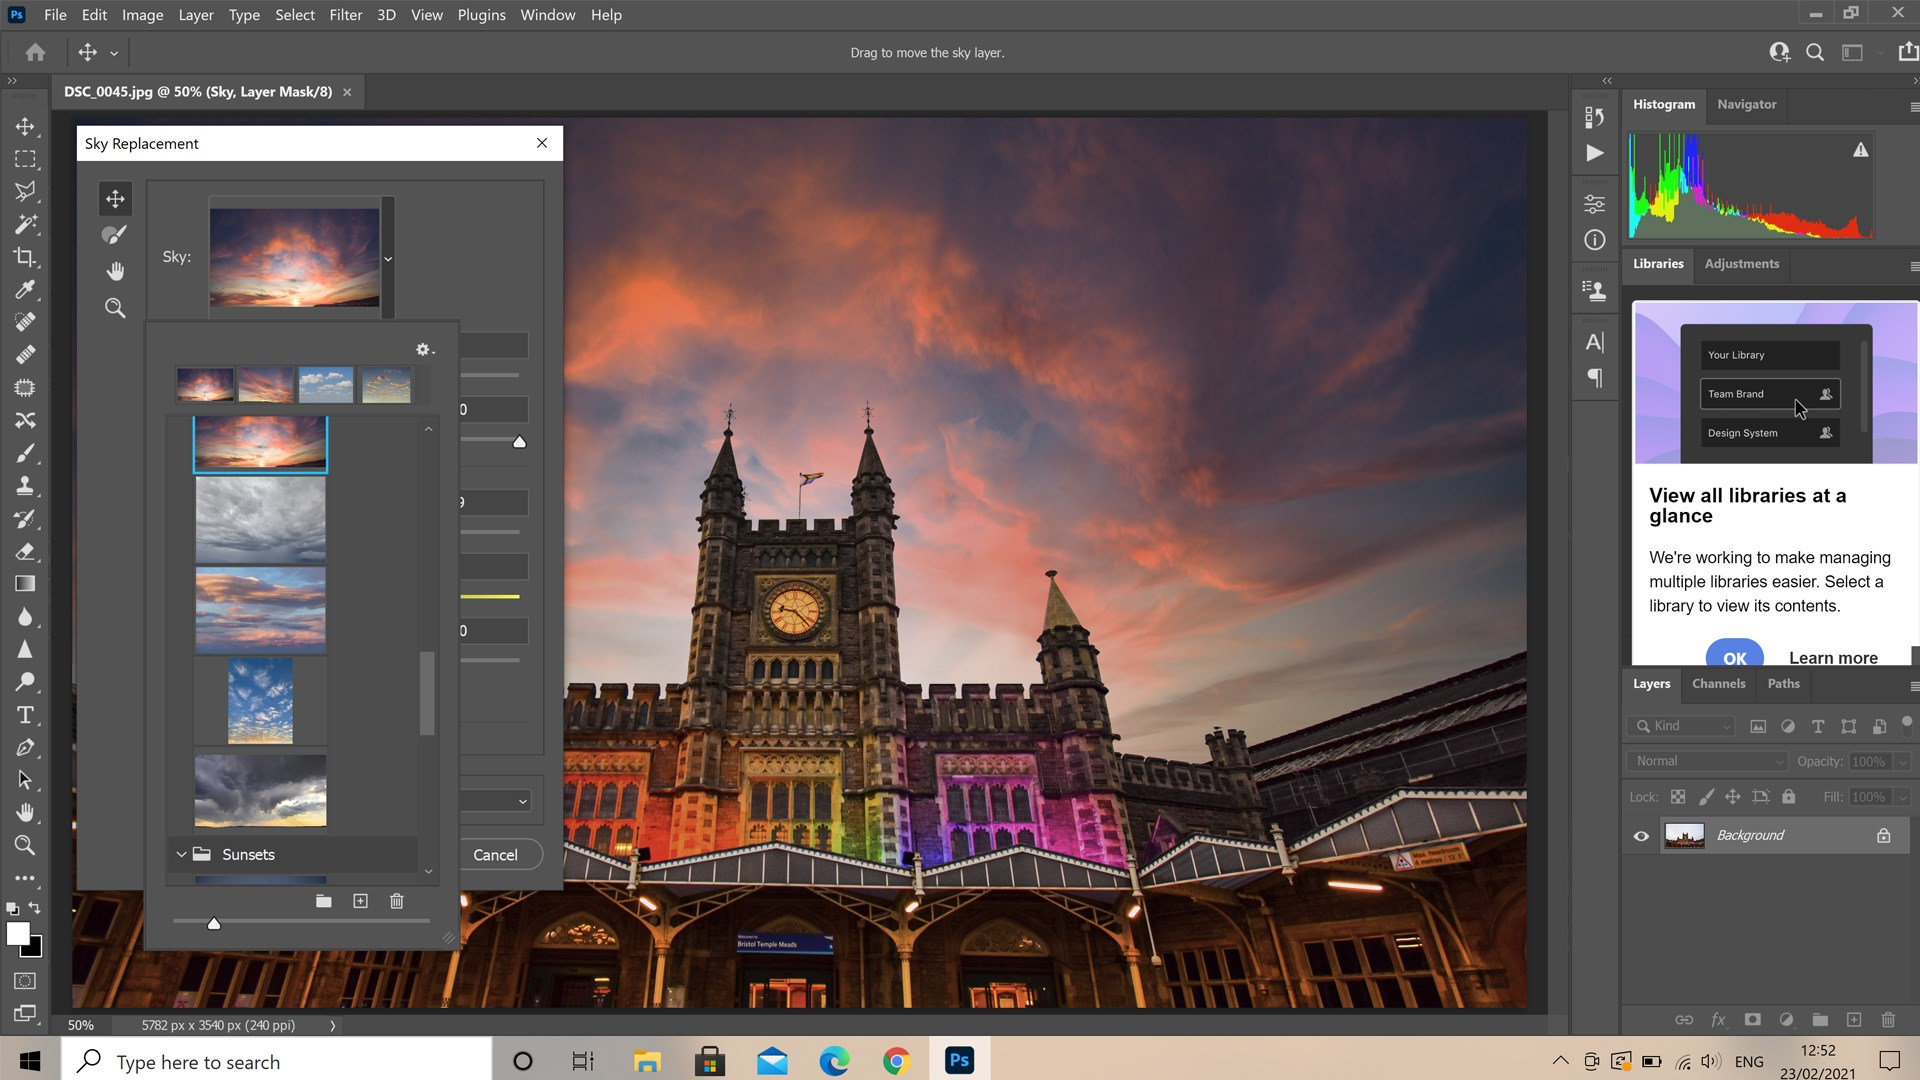 Adobe Photoshop software